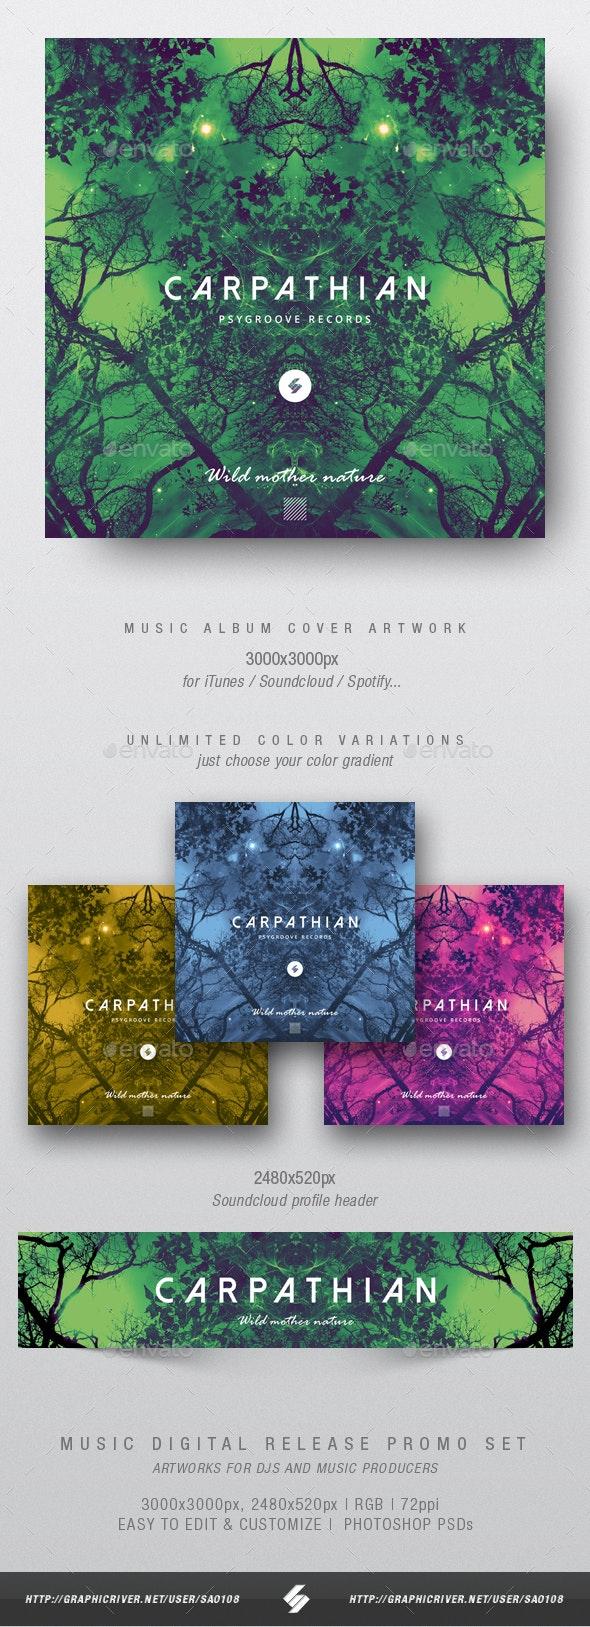 Carpathian - Psychedelic Trance Album Cover Template - Miscellaneous Social Media